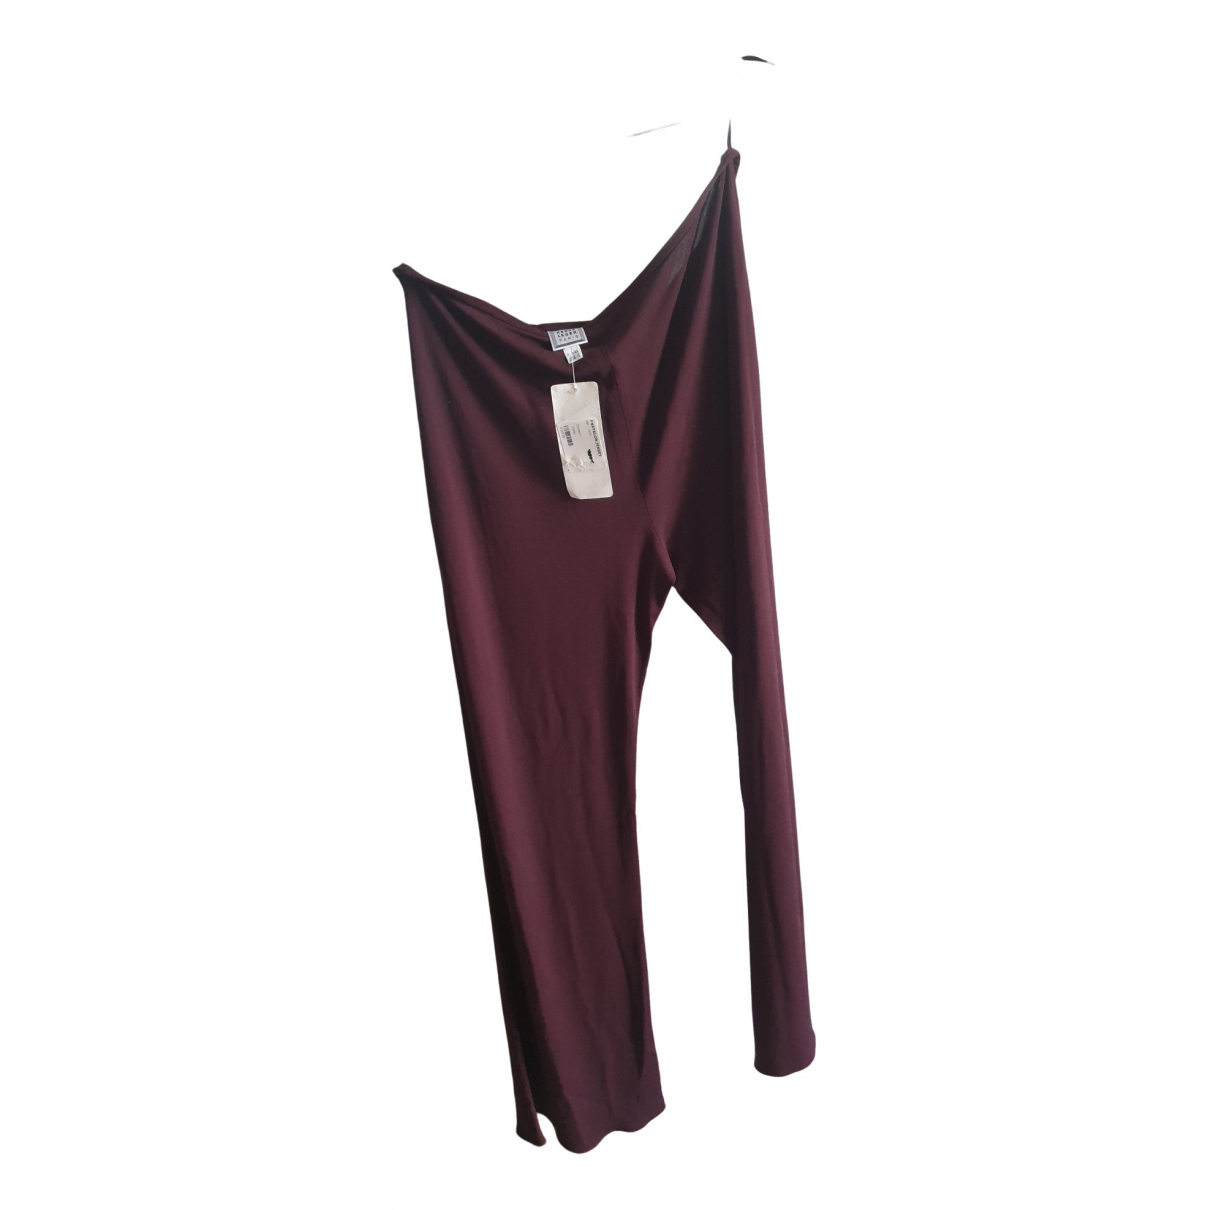 Pantalon en Sintetico Burdeos Non Signe / Unsigned